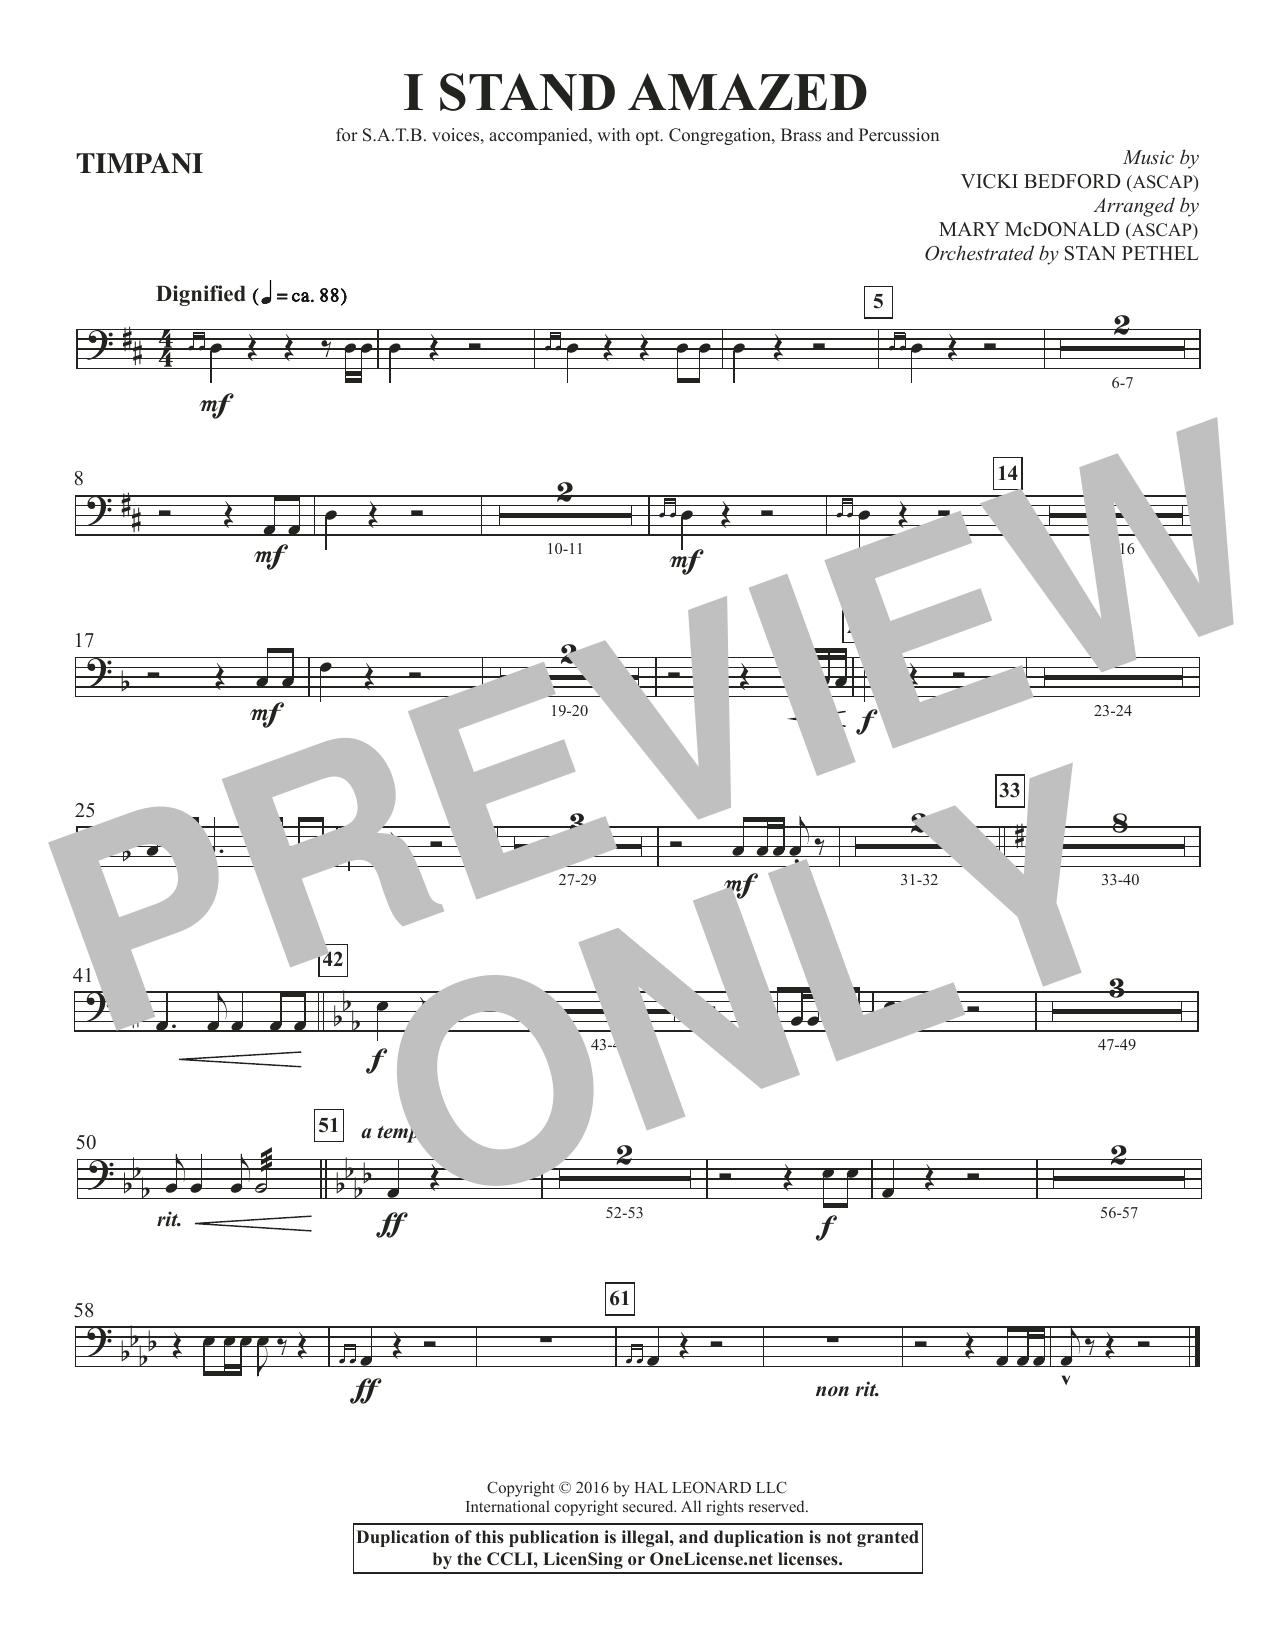 I Stand Amazed - Timpani Sheet Music